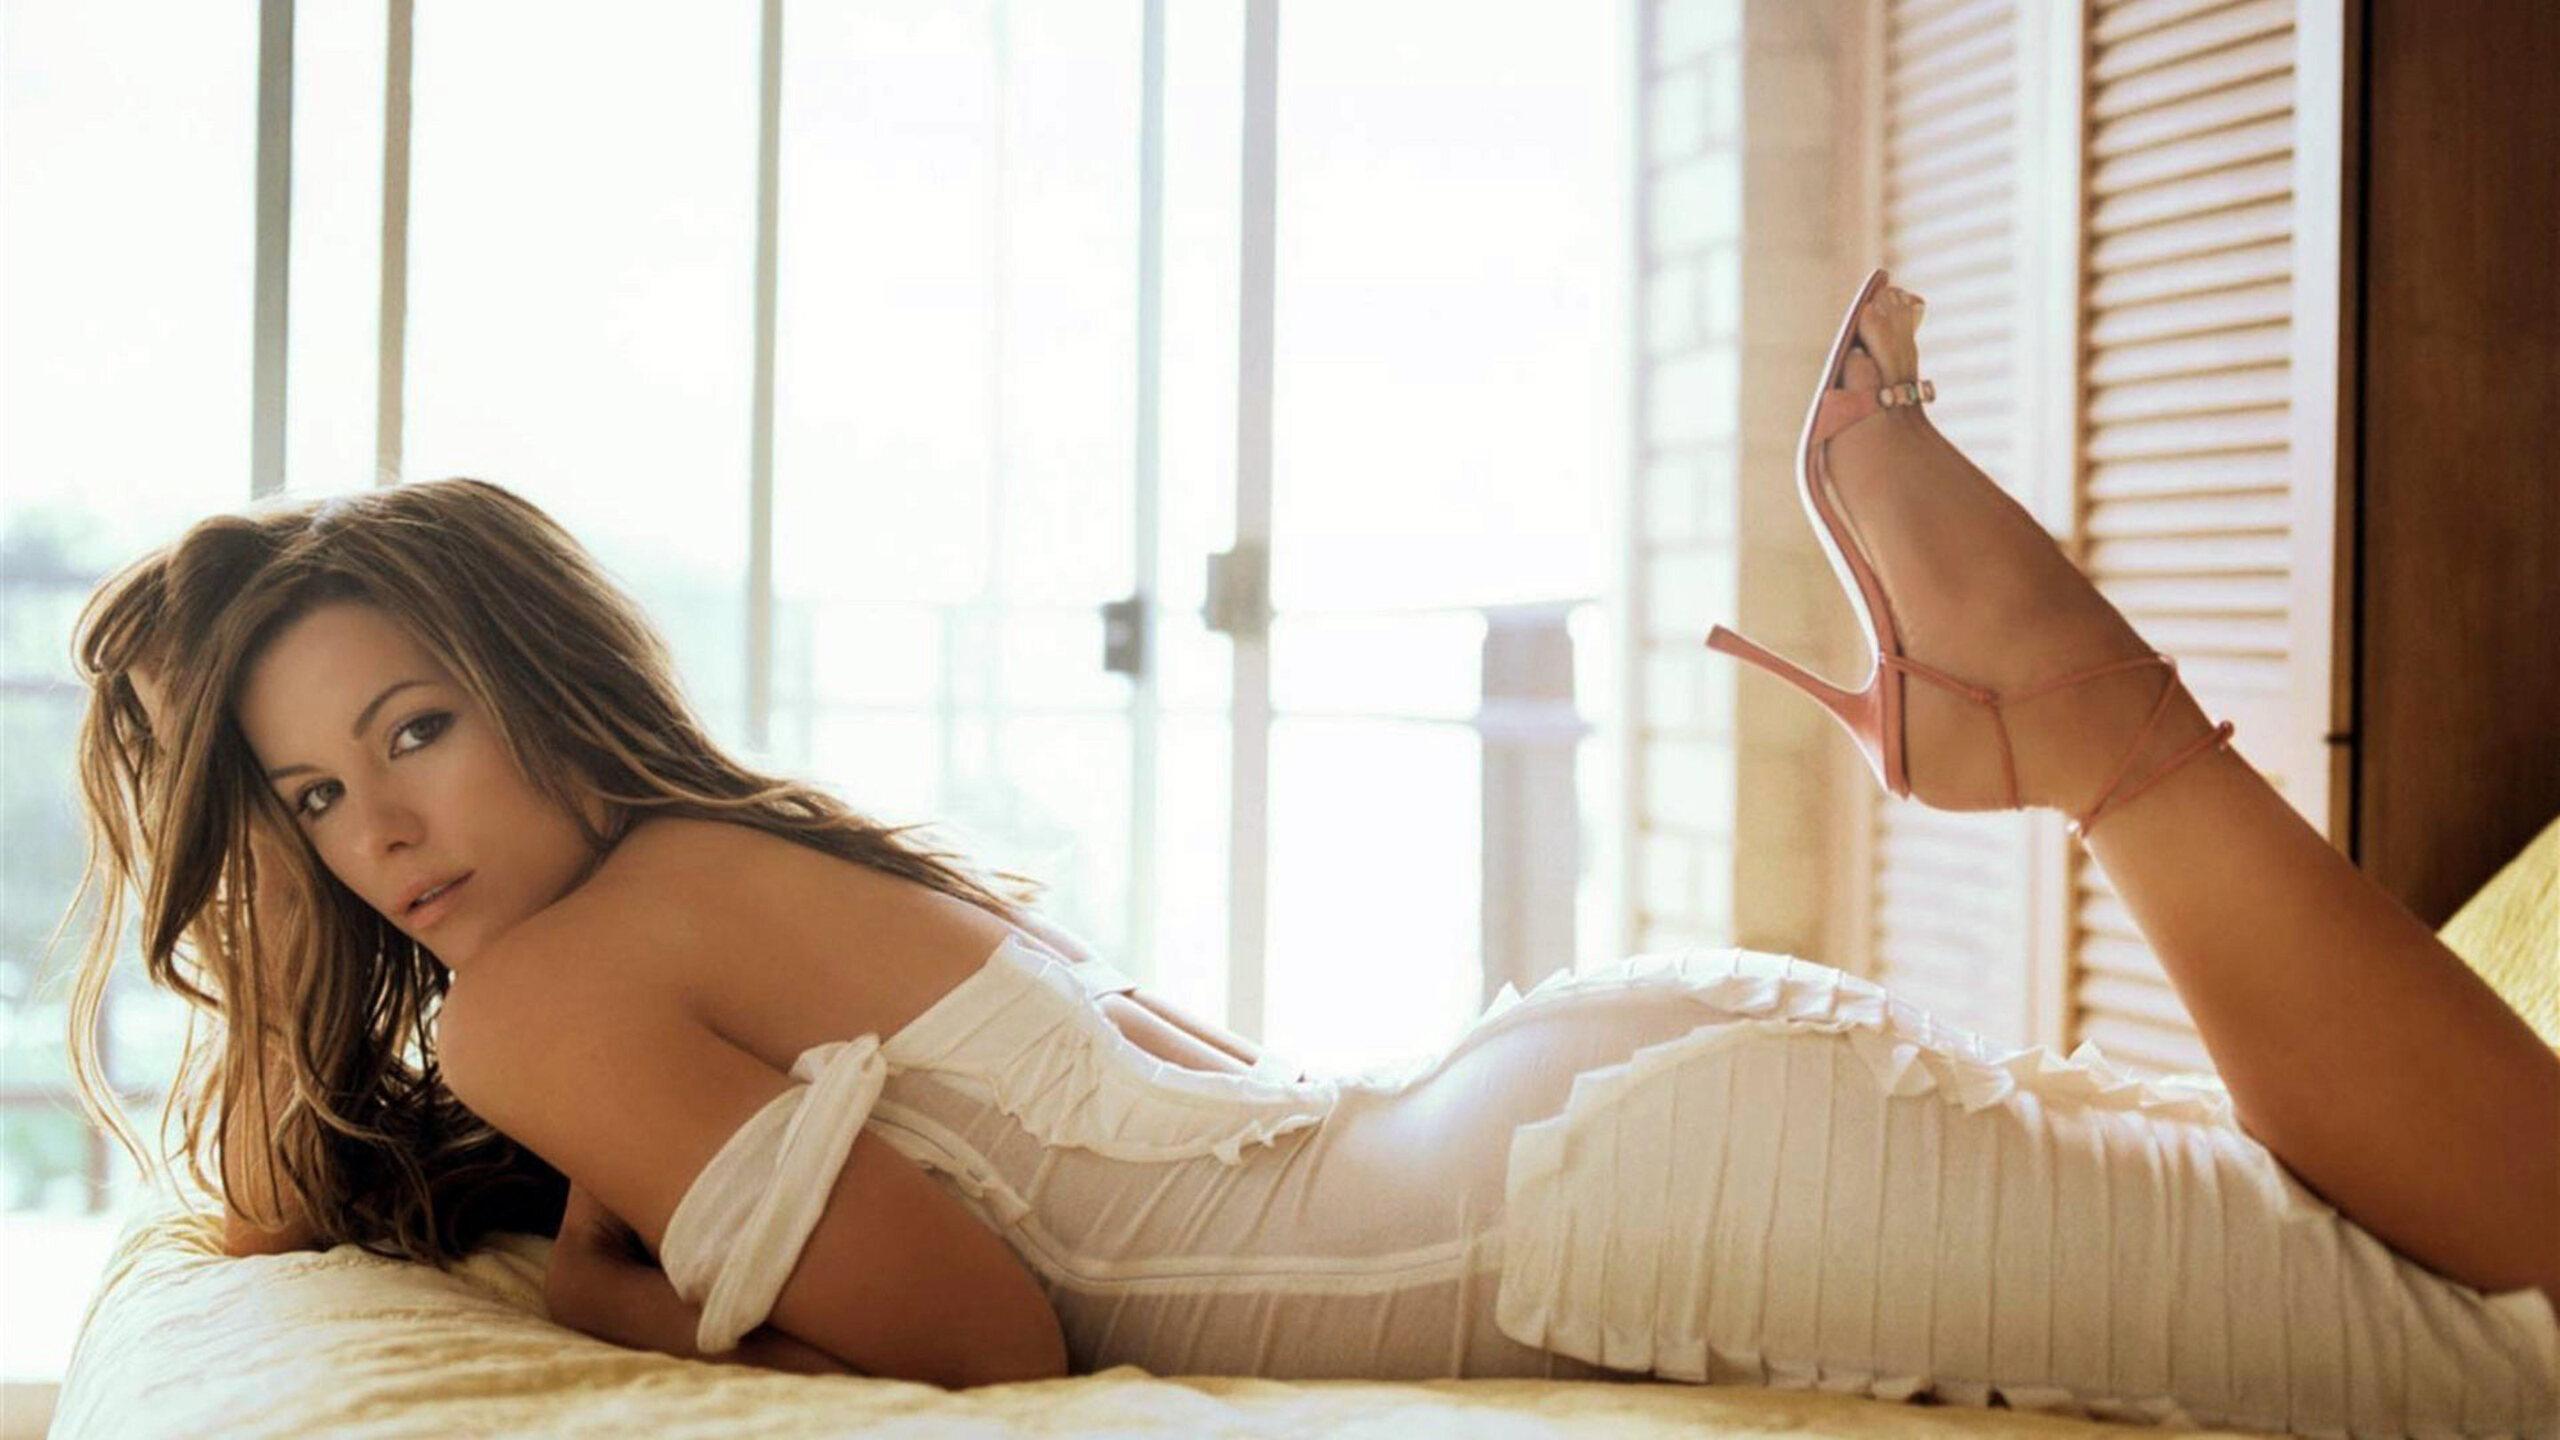 kate-young-nude-fake-pics-nylon-cum-shots